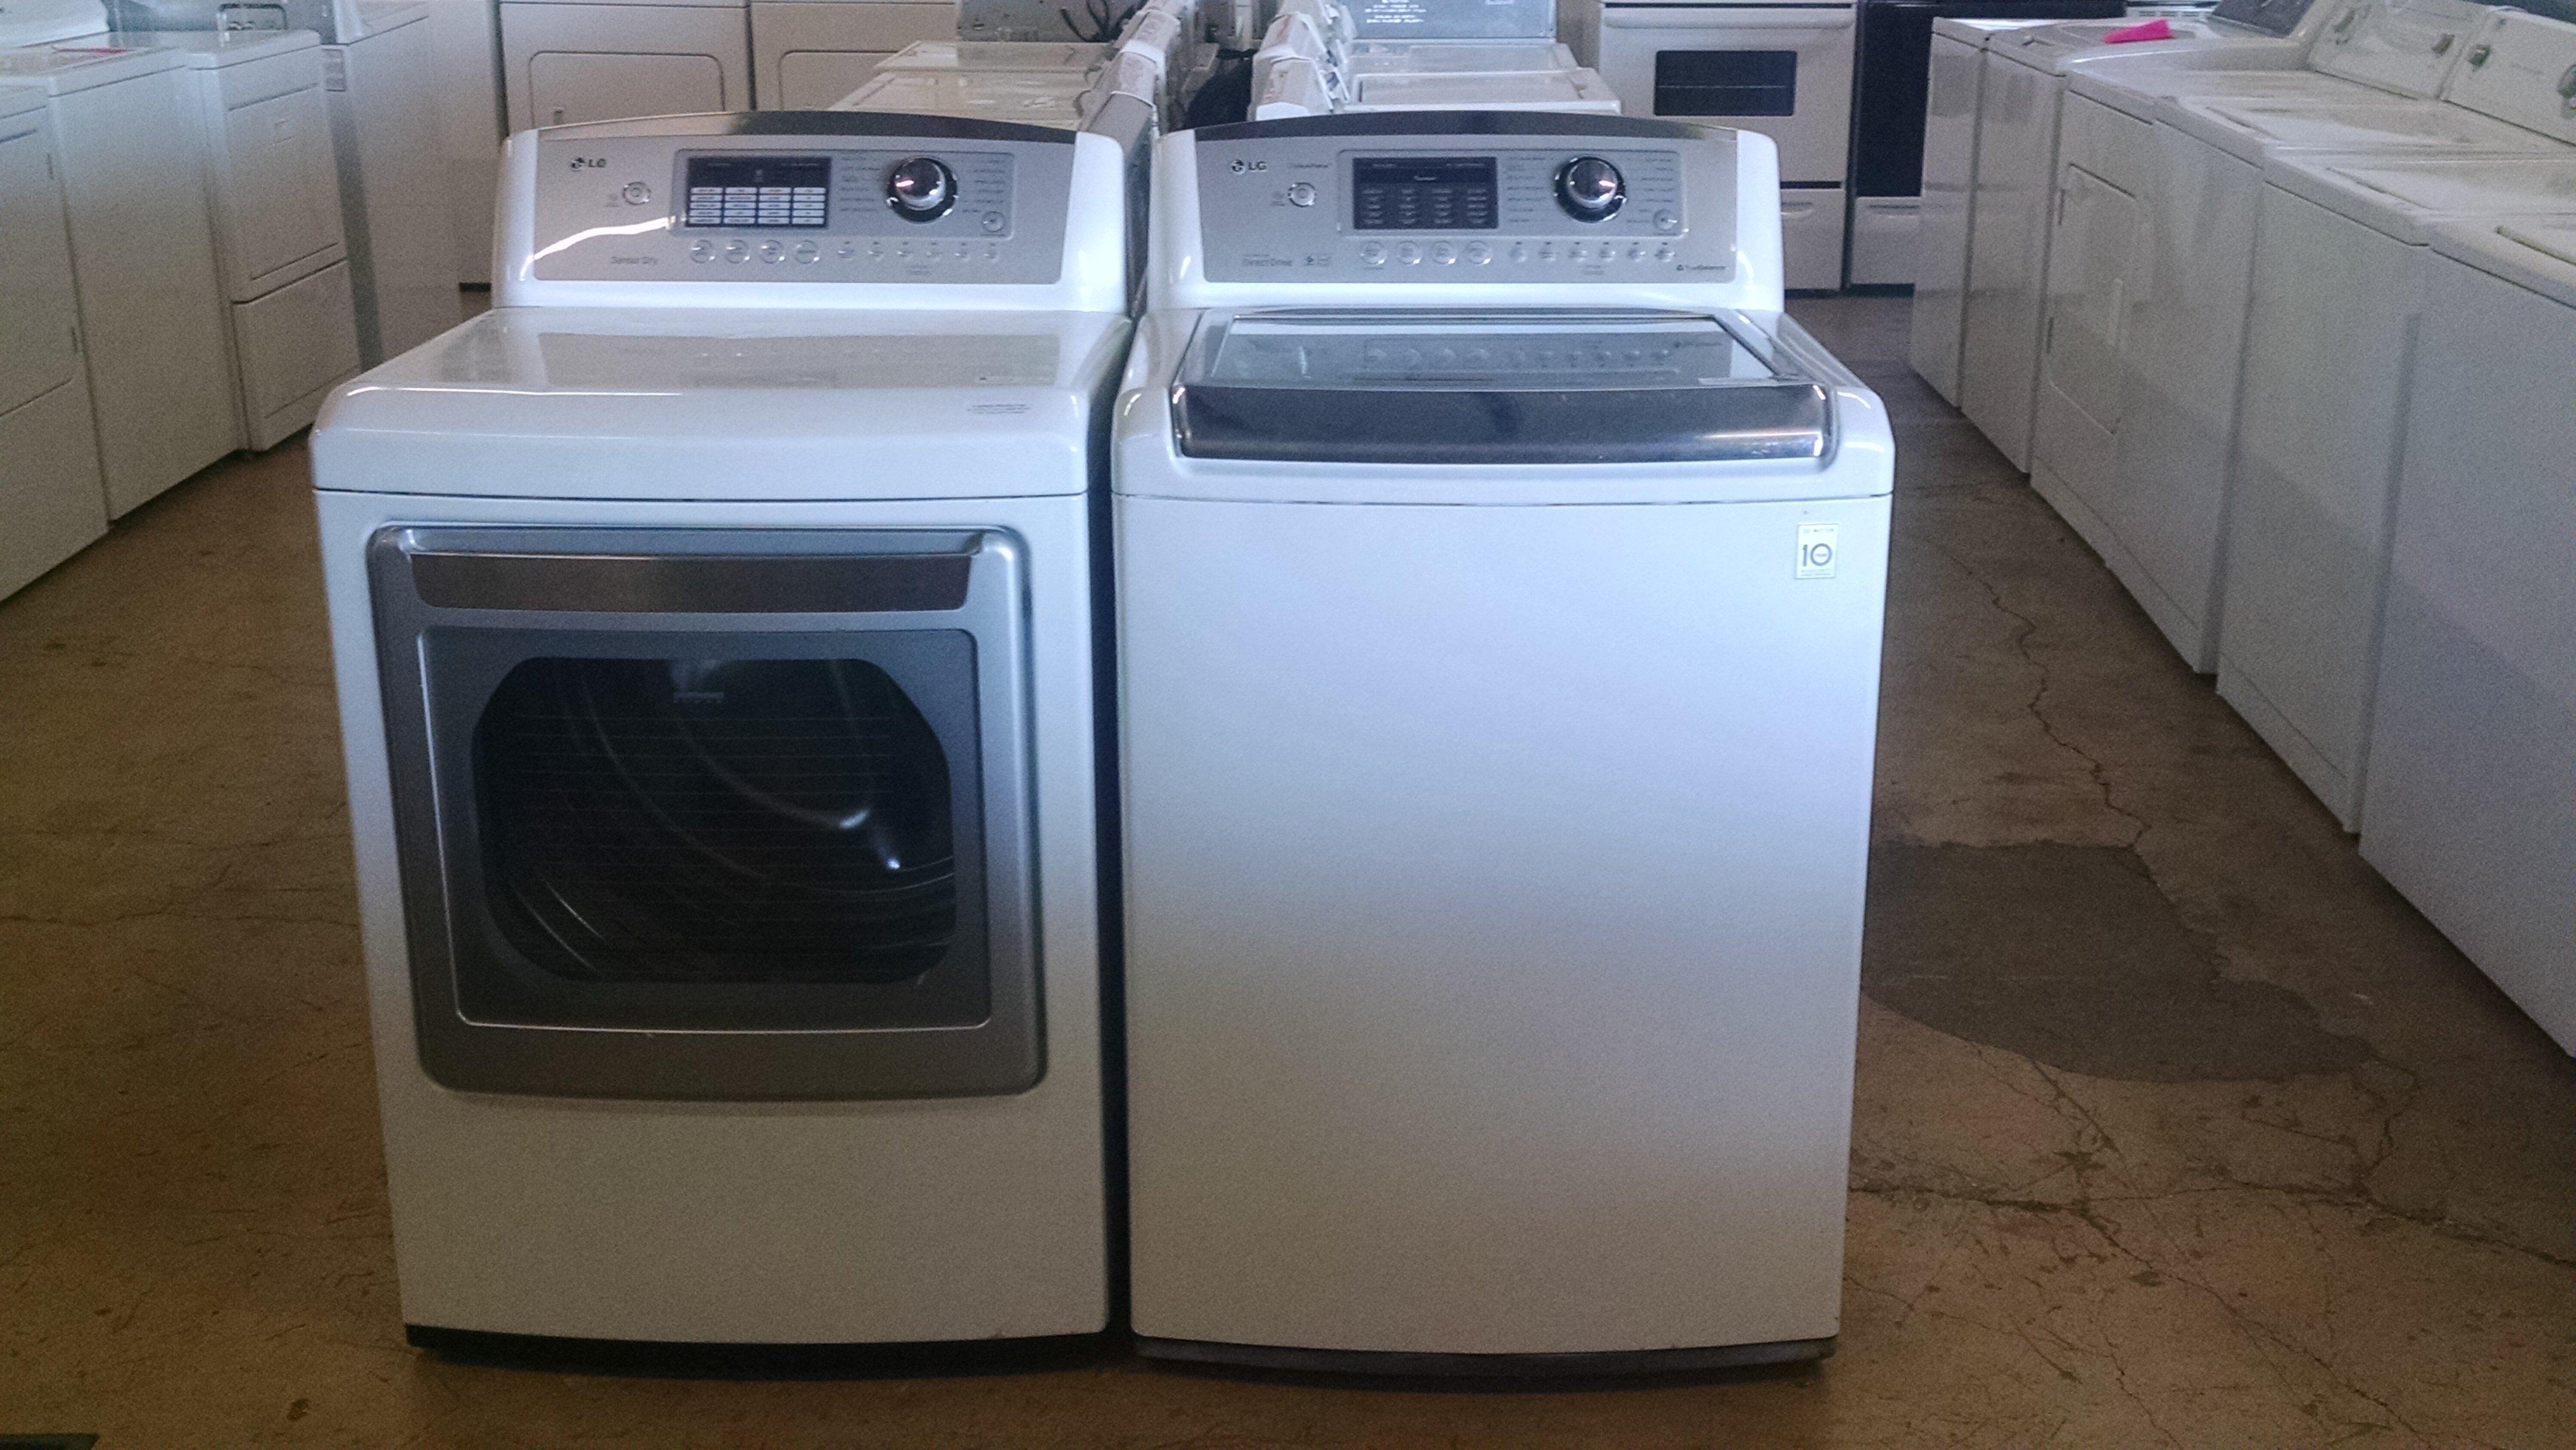 LG washer dryer set